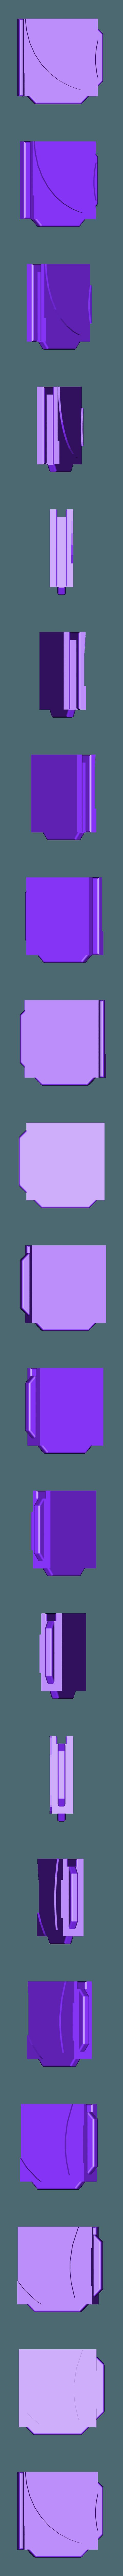 Piece - Part 6.stl Download free STL file Taquin CULTS / Sliding Puzzle • 3D print model, Valelab3D